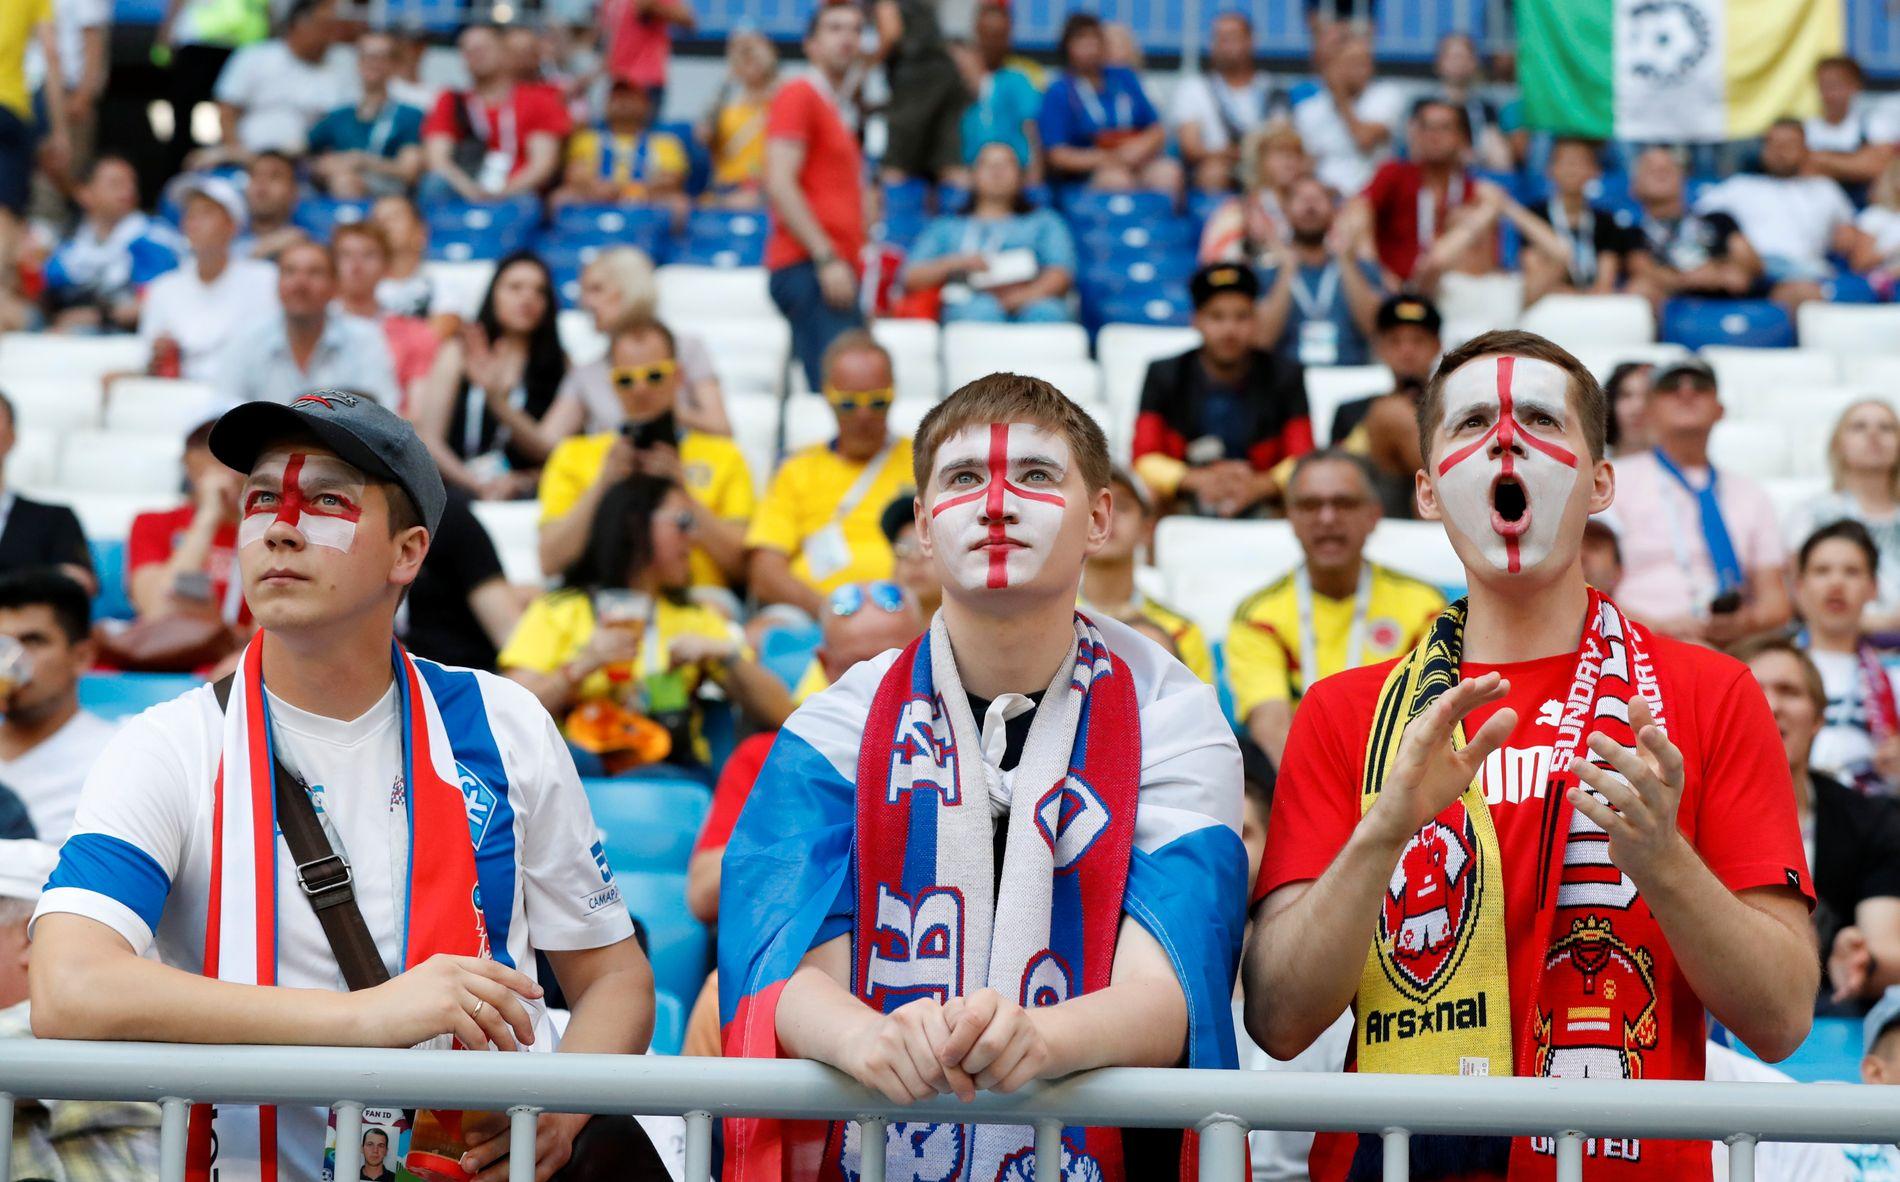 Fotballfans på tribunen i Samara under fotballkampen England-Sverige.